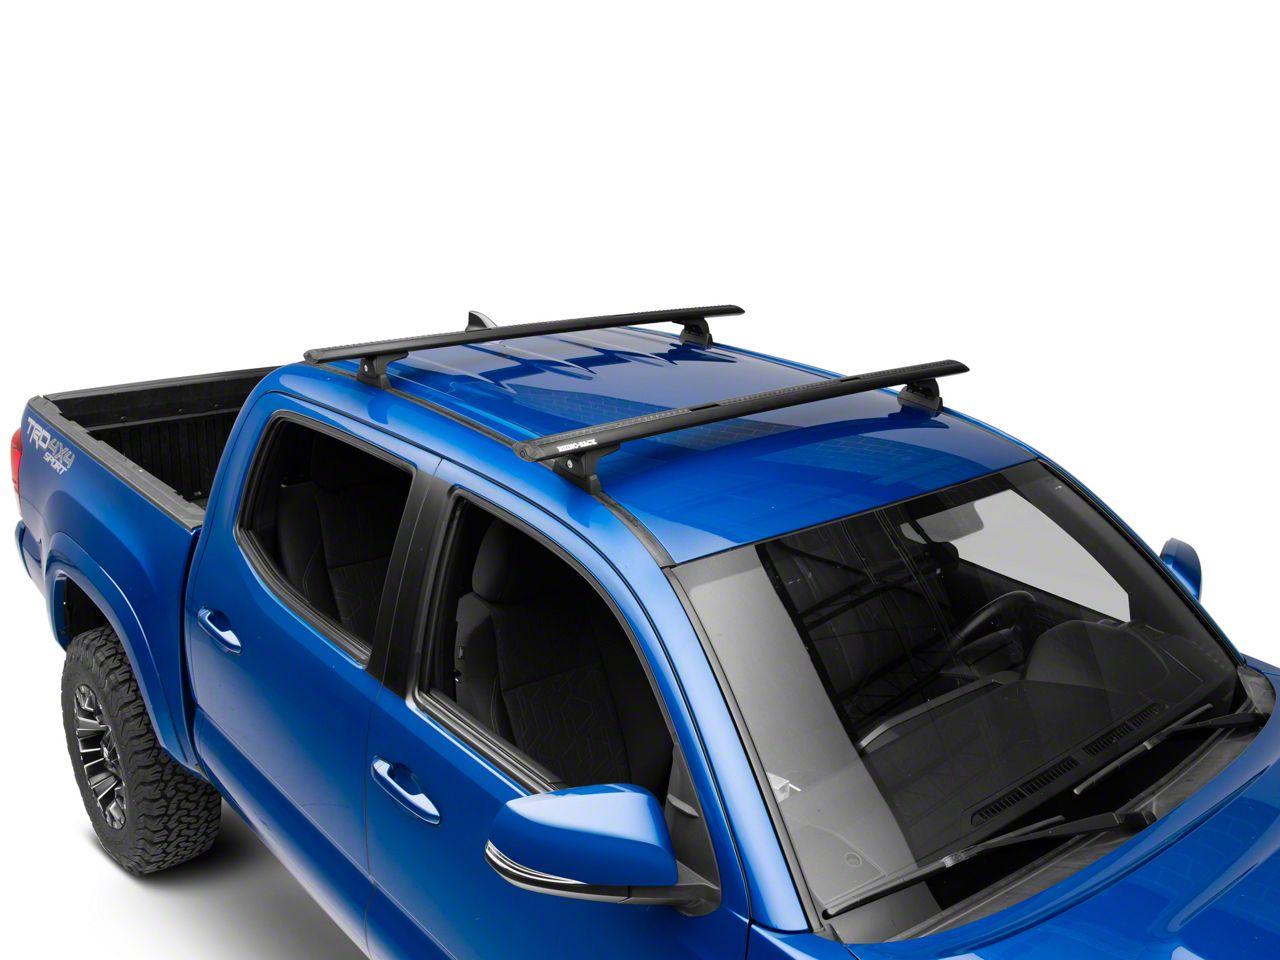 Rhino-Rack Vortex RLT600 Trackmount 2-Bar Roof Rack - Black (05-19 Tacoma Double Cab)